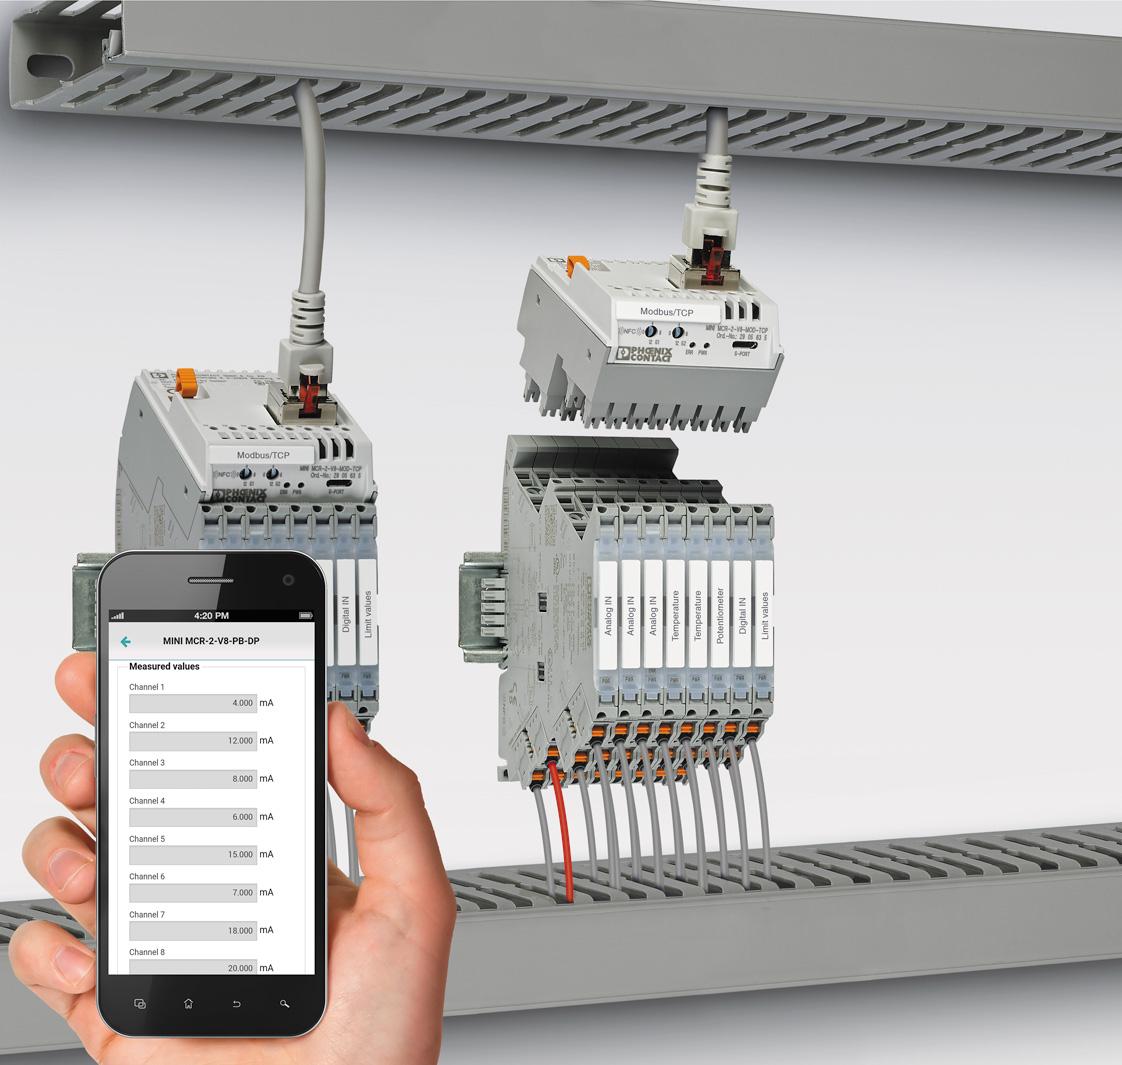 настройка устройств серии MINI Analog Pro посредством NFC-интерфейса